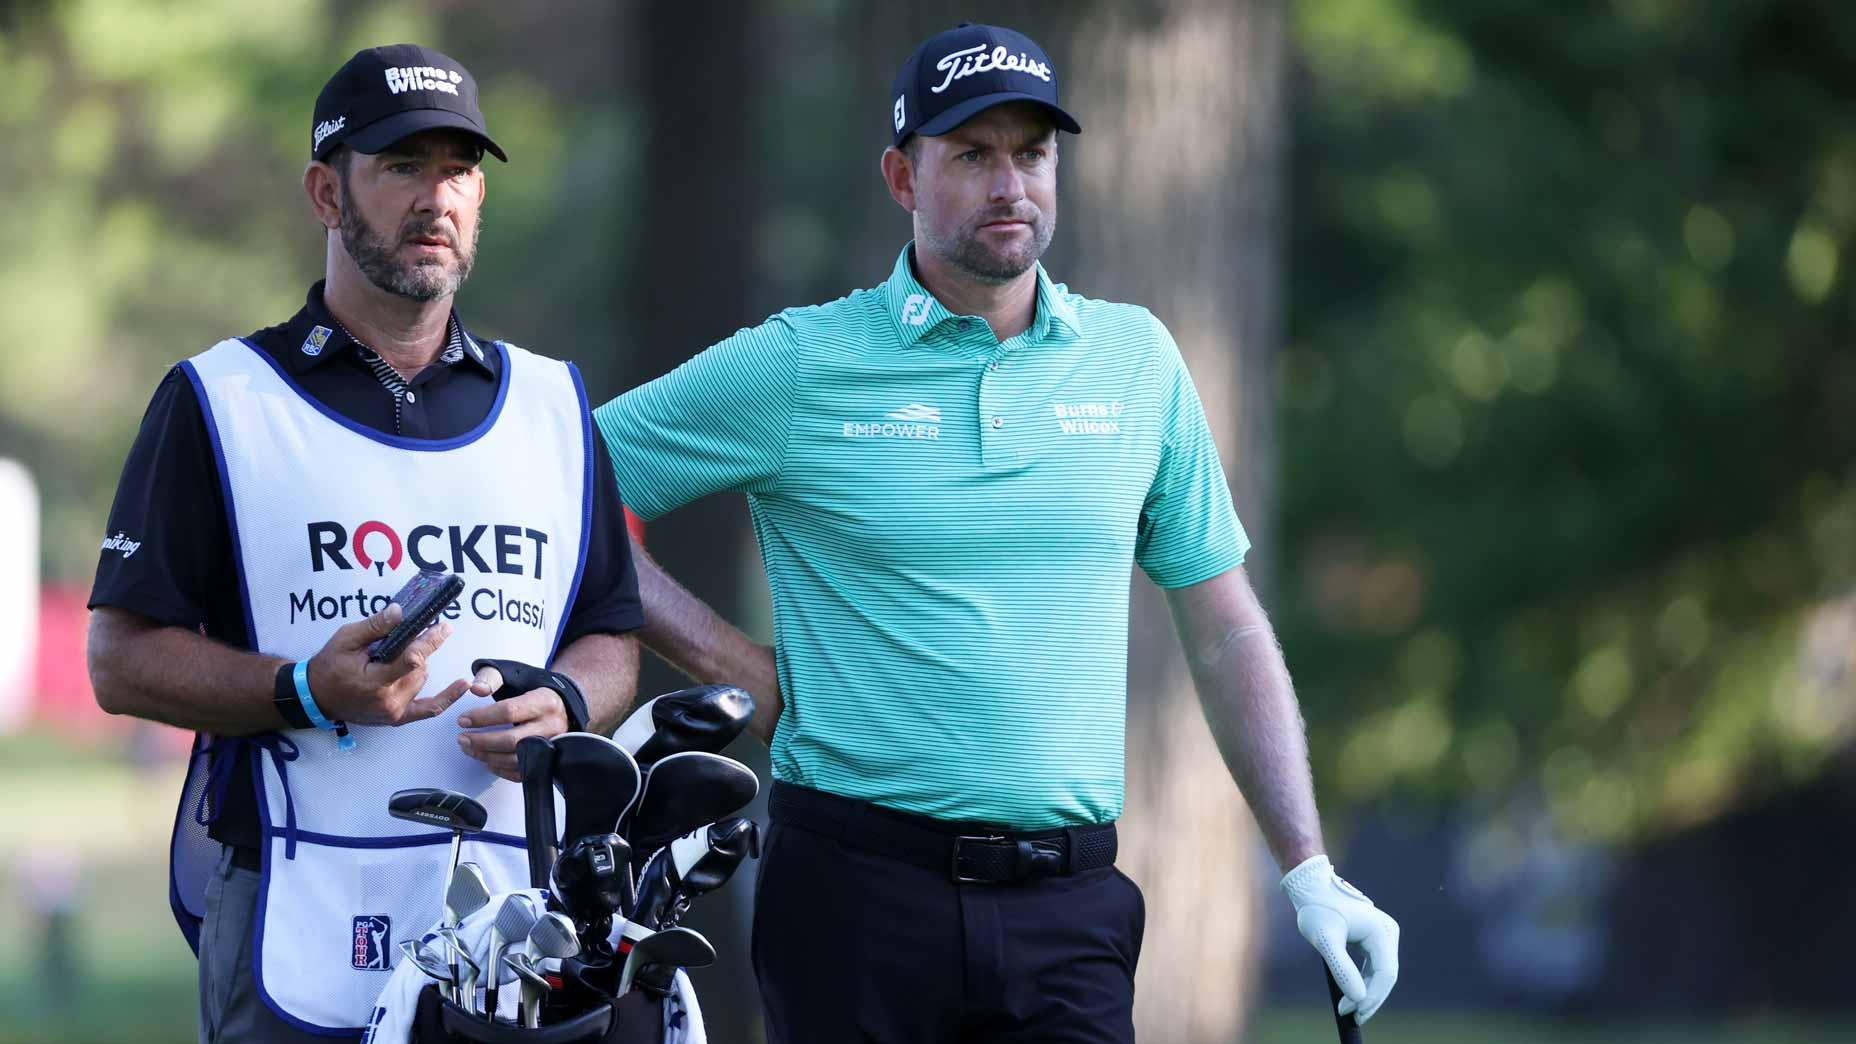 Pro golfer Webb Simpson with caddie